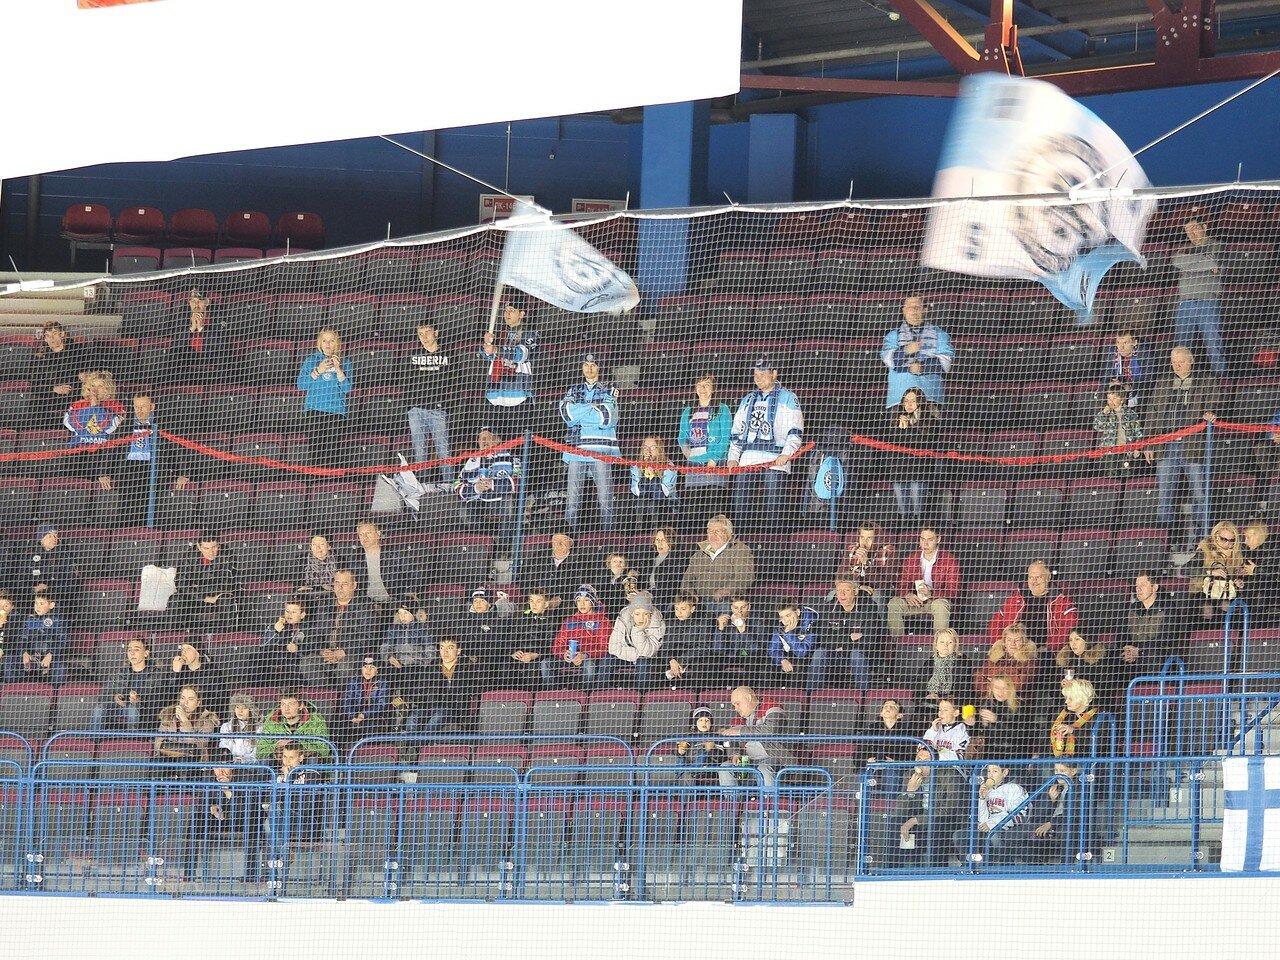 80Плей-офф 2016 Восток 1/2 Металлург - Сибирь 10.03.2016